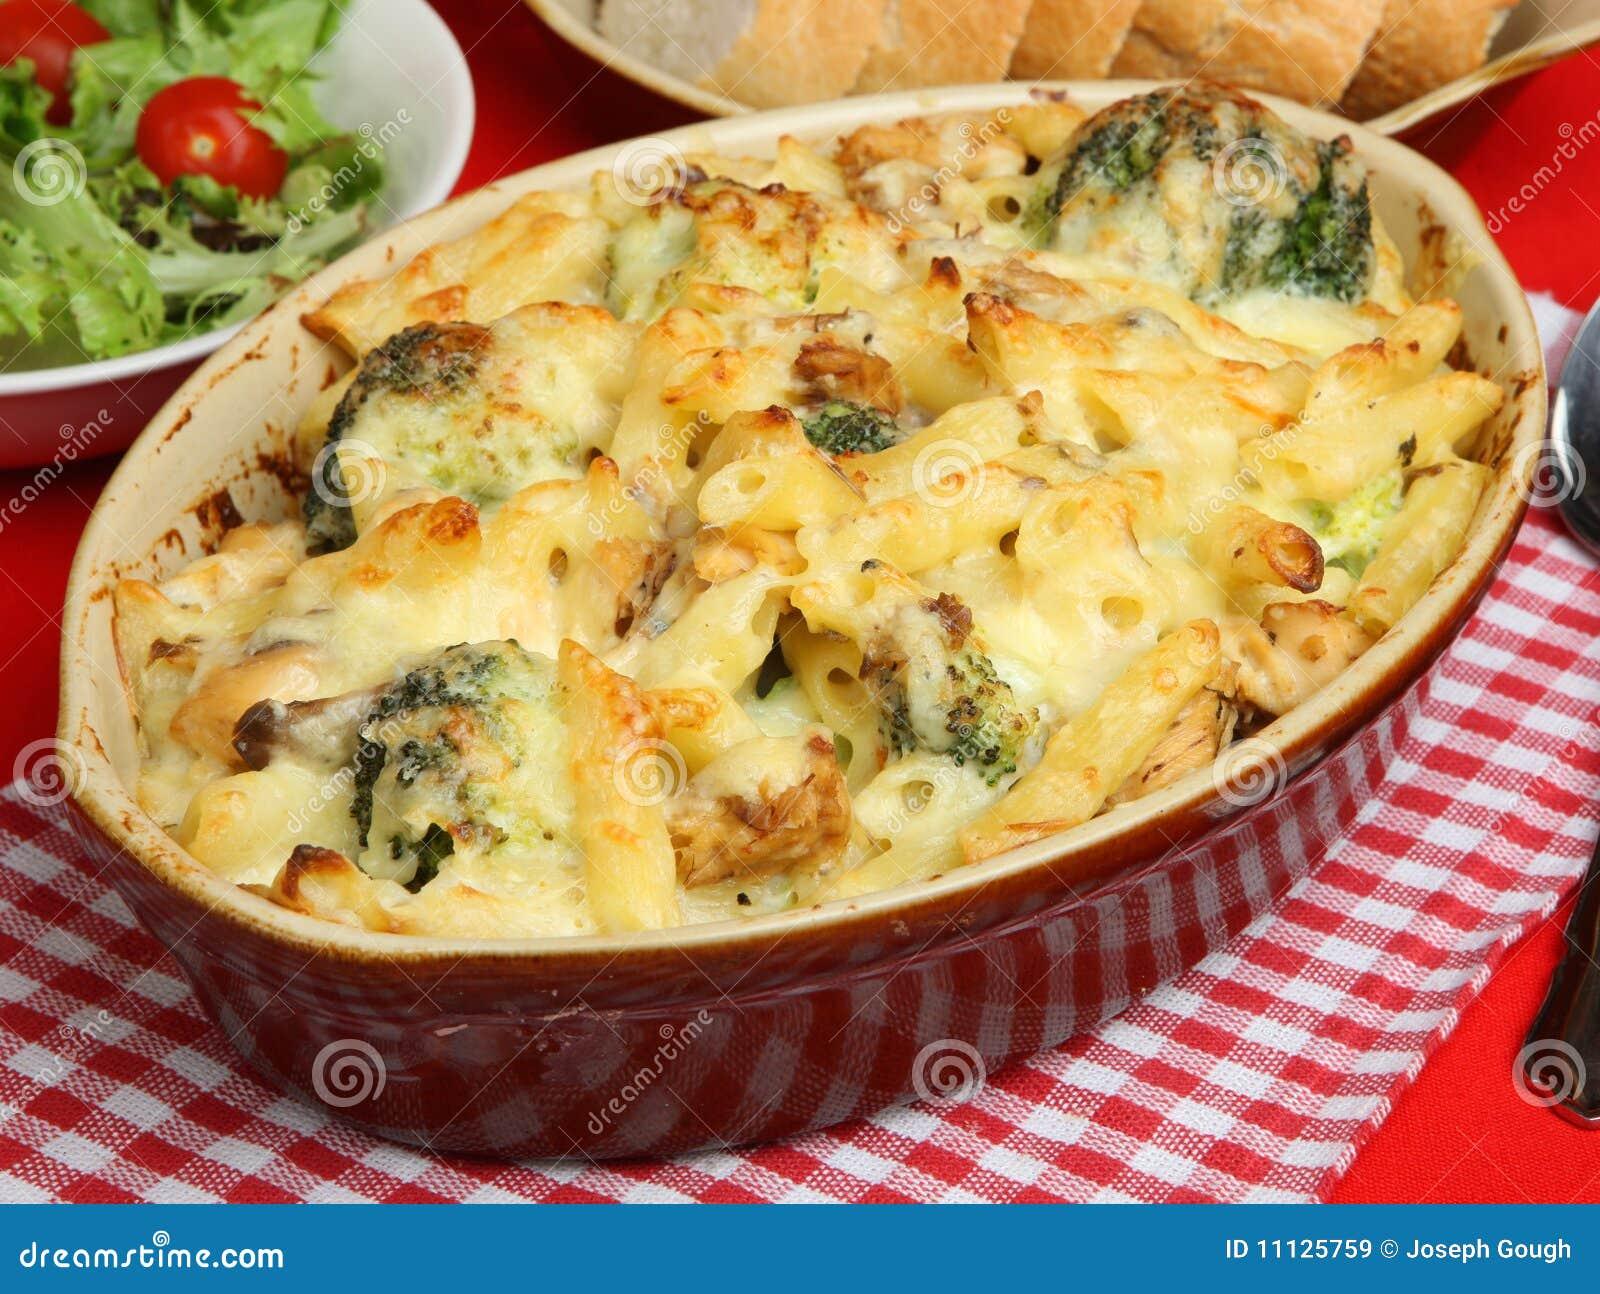 More Similar Stock Images Of Salmon Broccoli Pasta Bake